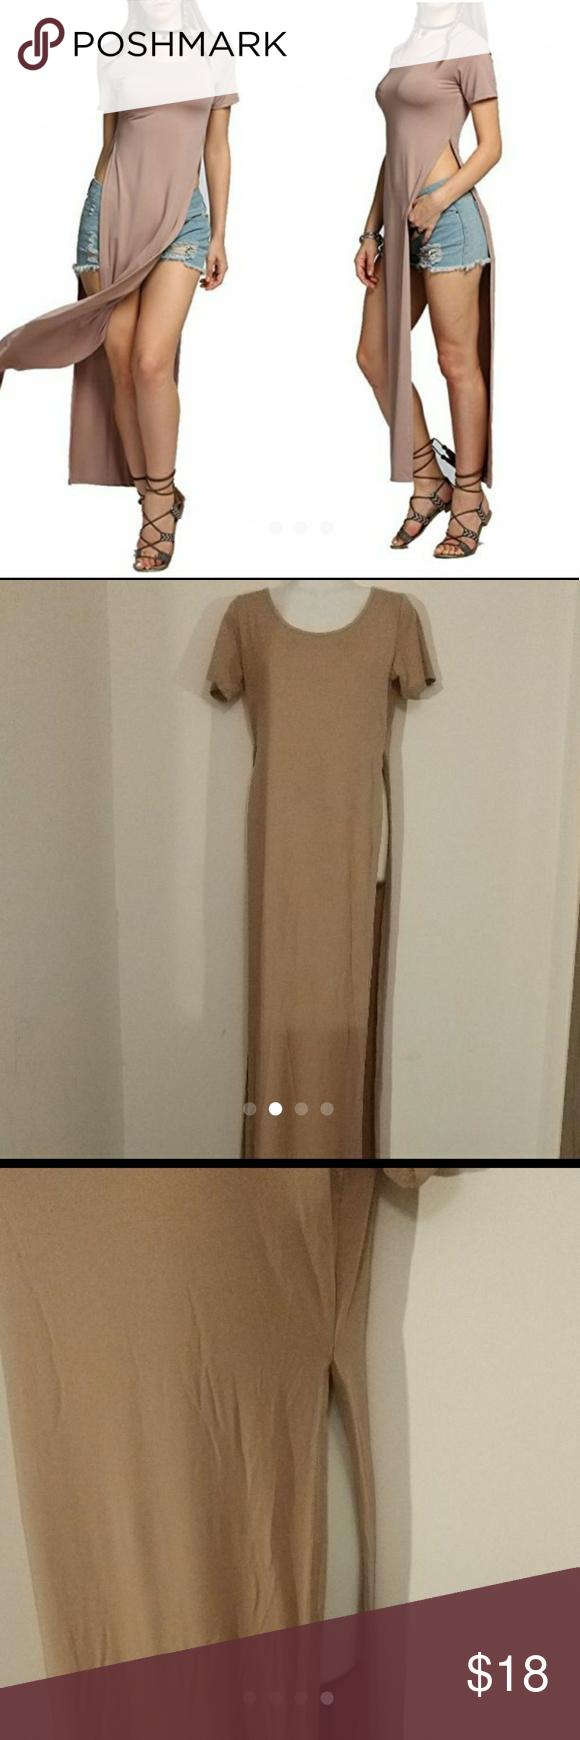 0fe63bdb2 Maxi dress Women s Casual Short Sleeve  Sleeveless T Shirts Tops Open Side  Split